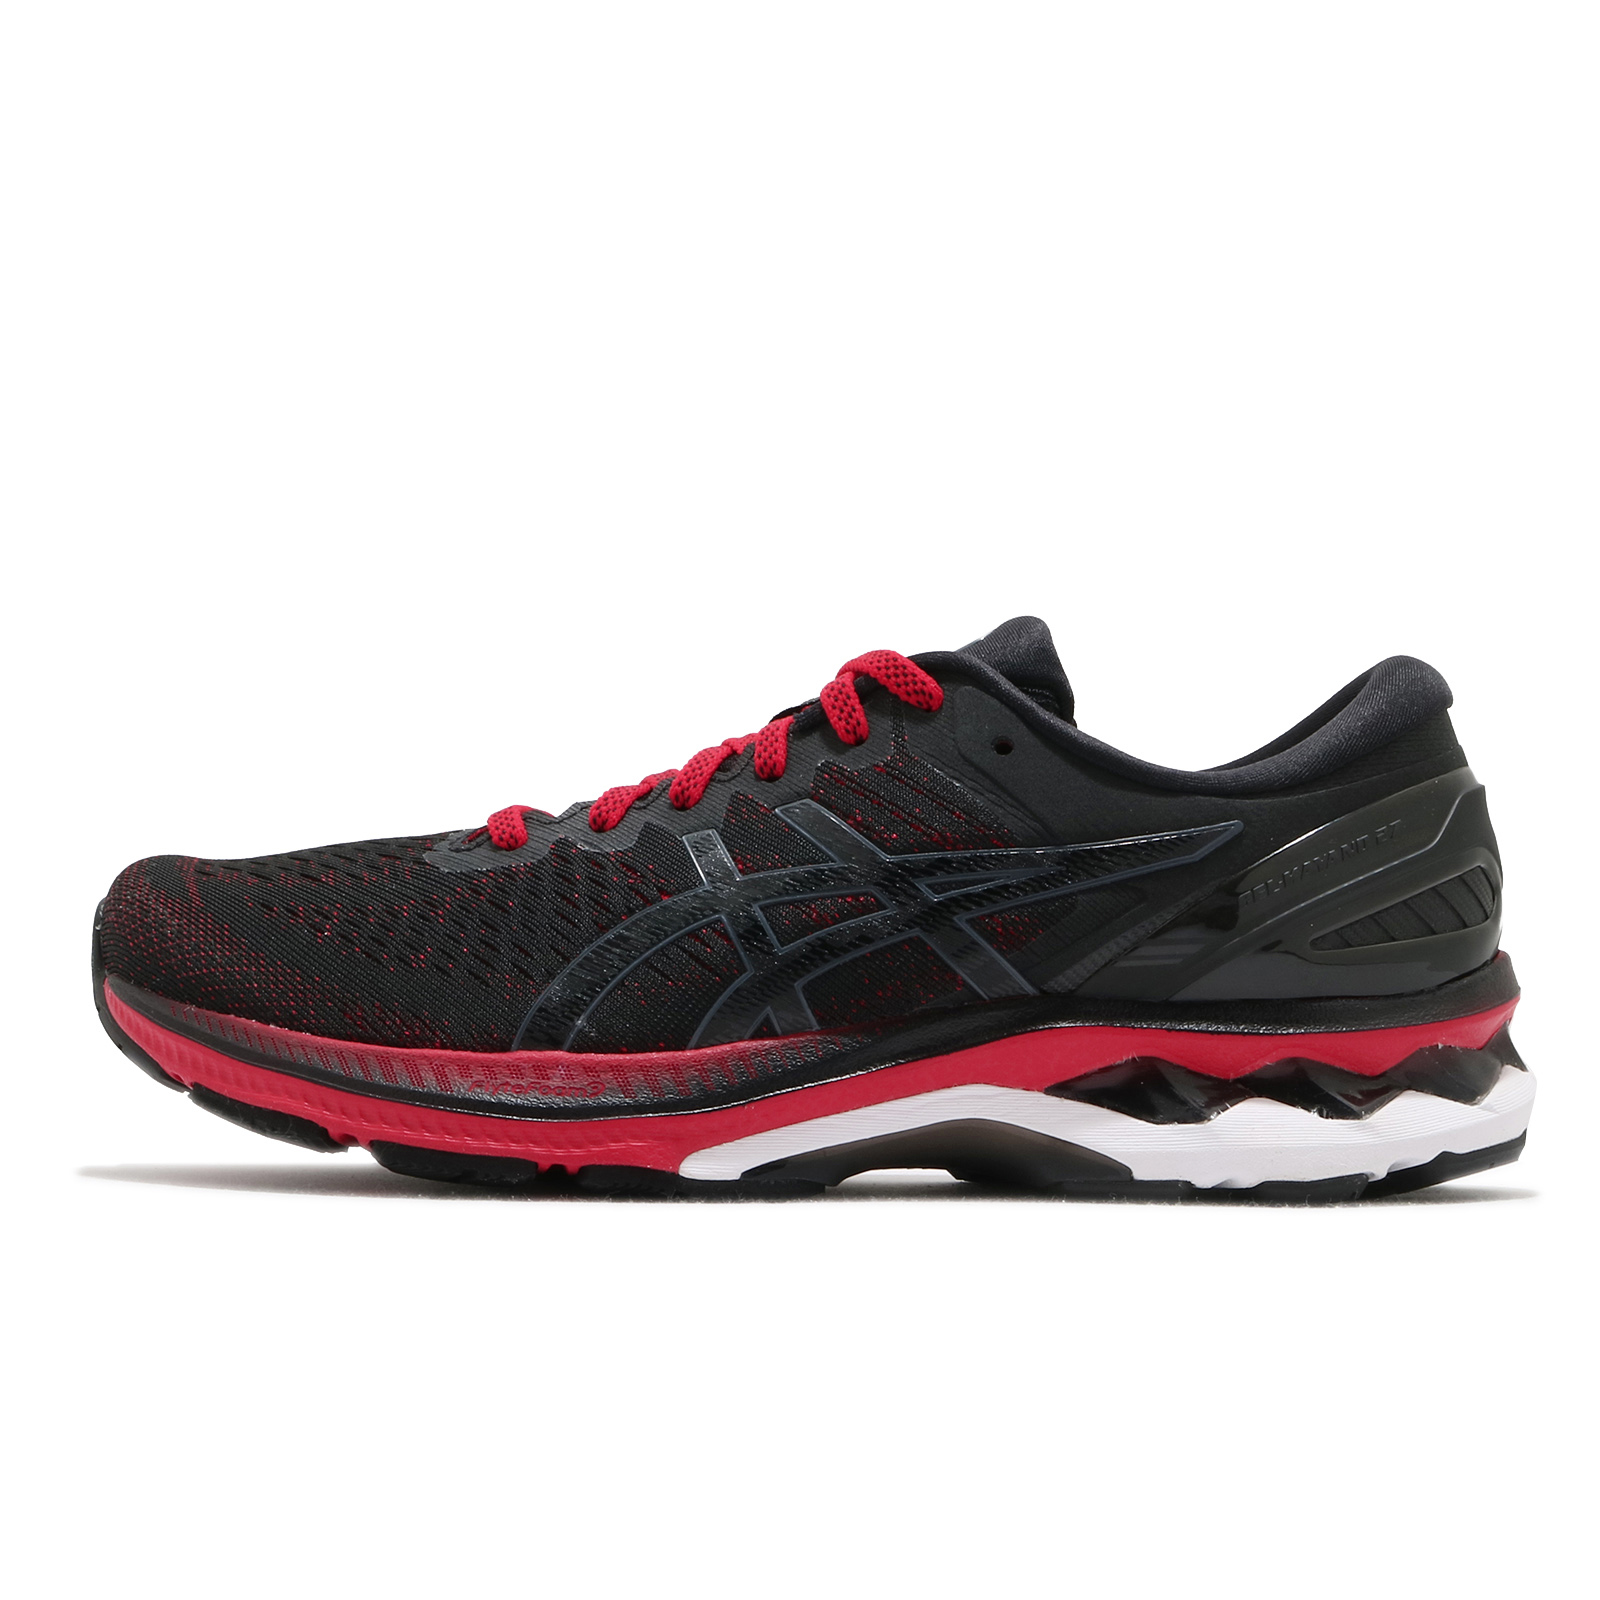 Asics 慢跑鞋 Gel-Kayano 27 黑 紅 亞瑟士 路跑 男鞋 馬拉松 【ACS】 1011A767-600